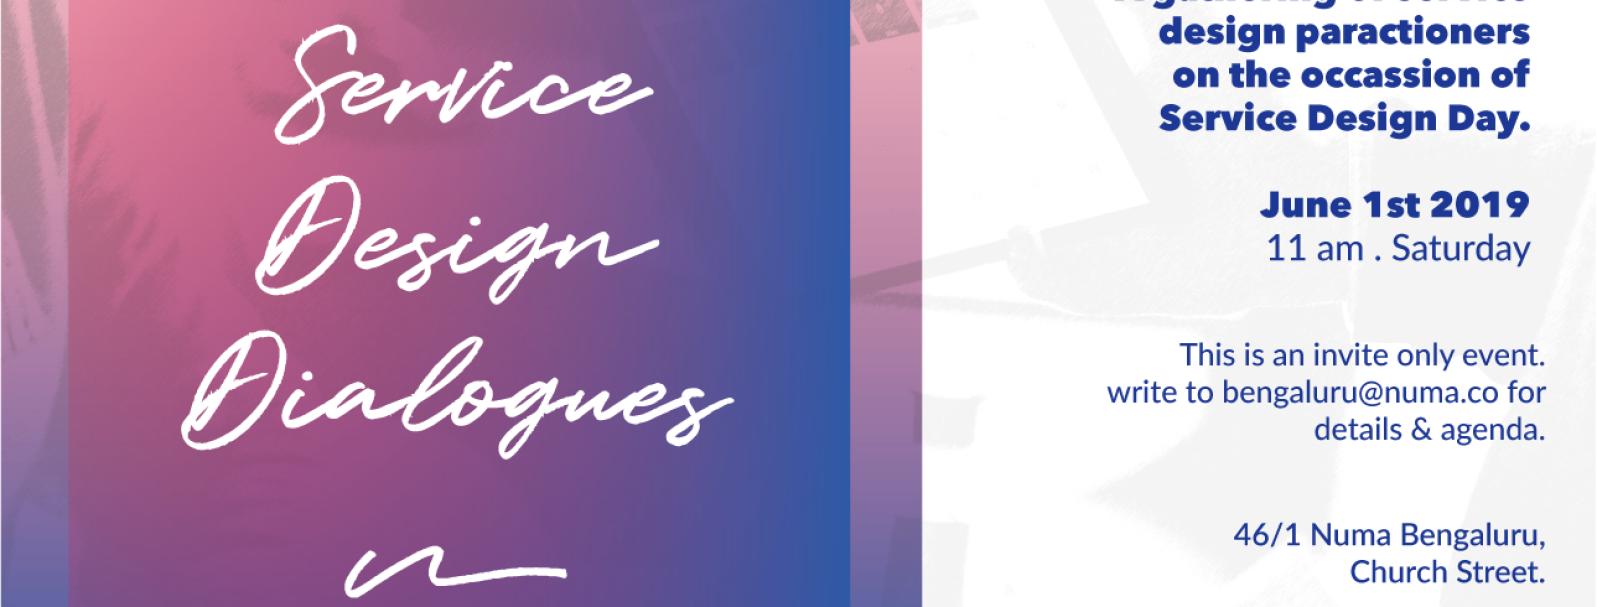 Service Design Dialogues